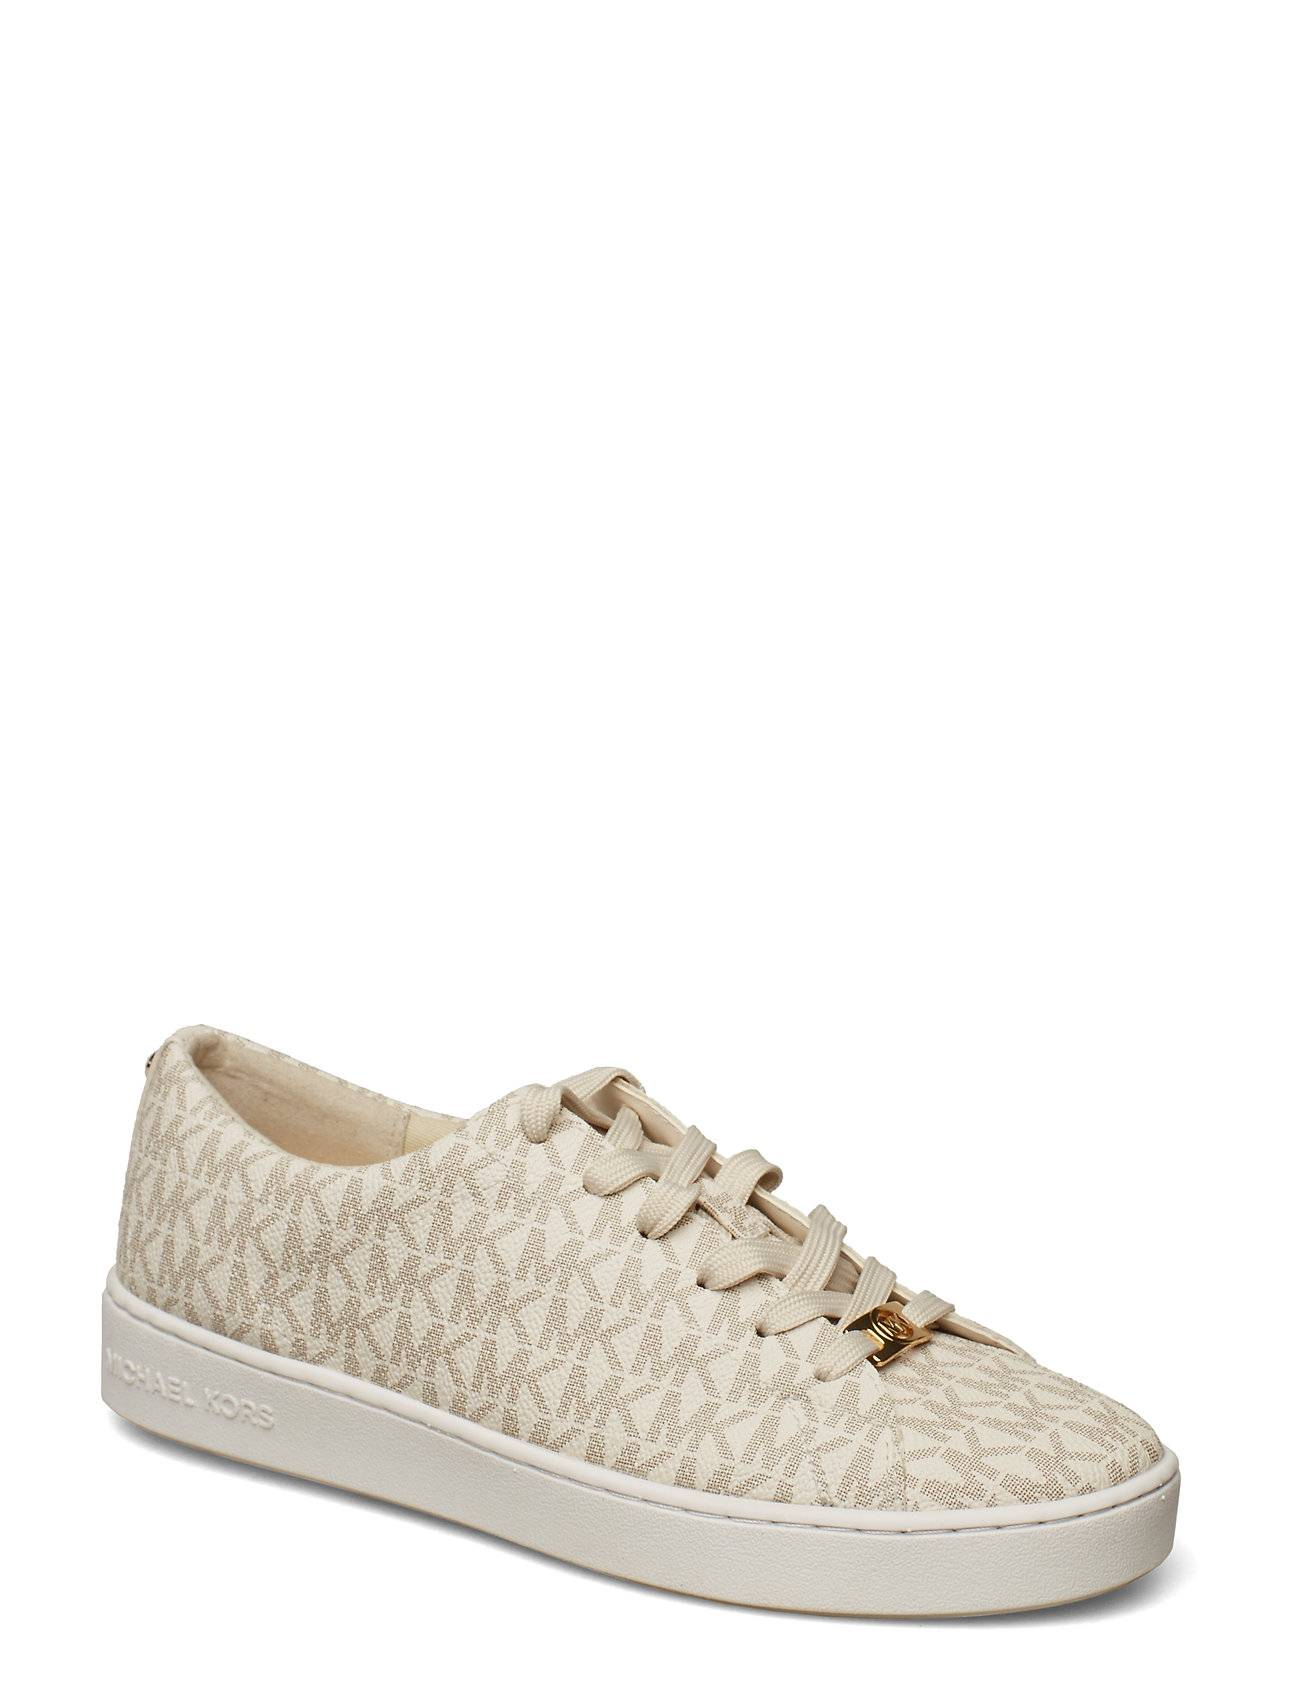 Michael Kors Shoes Keaton Lace Up